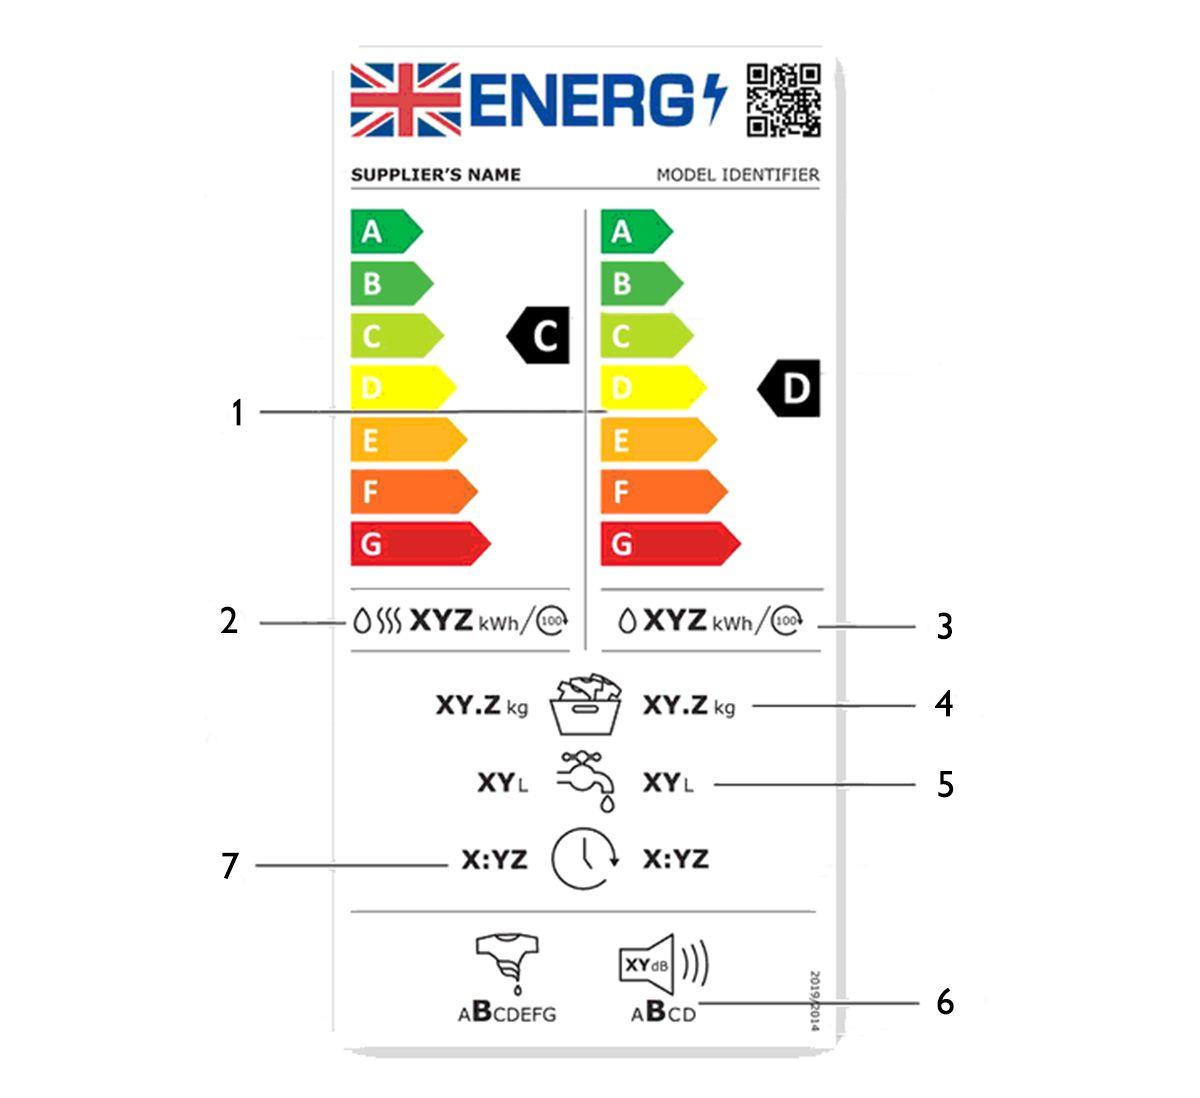 washing dryers energy label